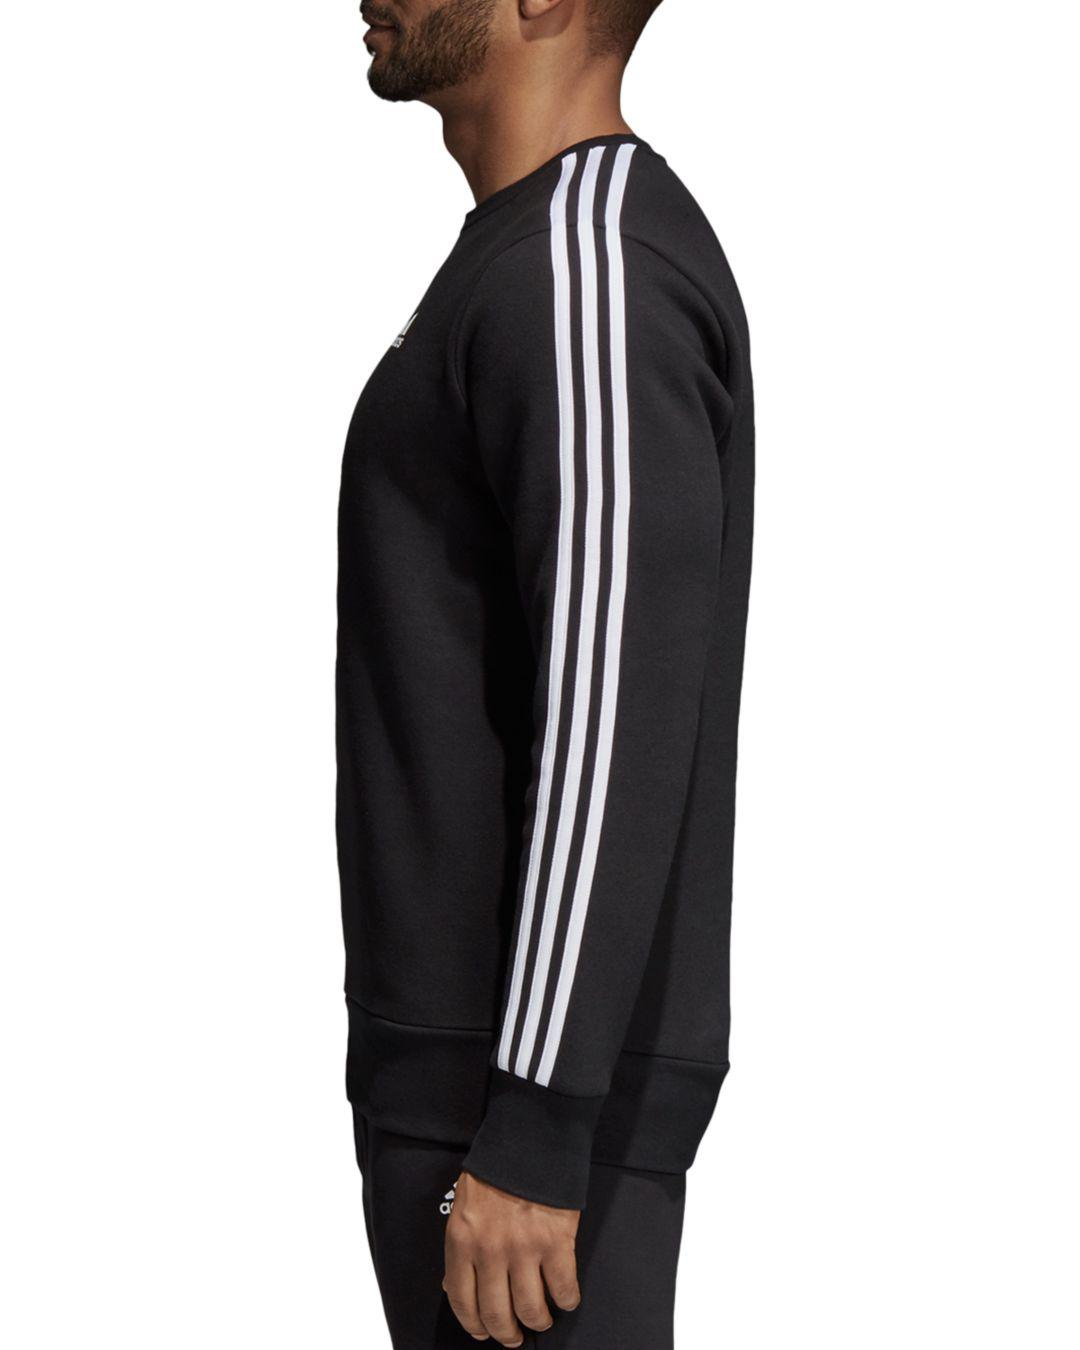 mäßiger Preis 100% Qualität billiger Verkauf Adidas Mens Essential 3 Stripe Crew Neck Sweatshirt Navy ...